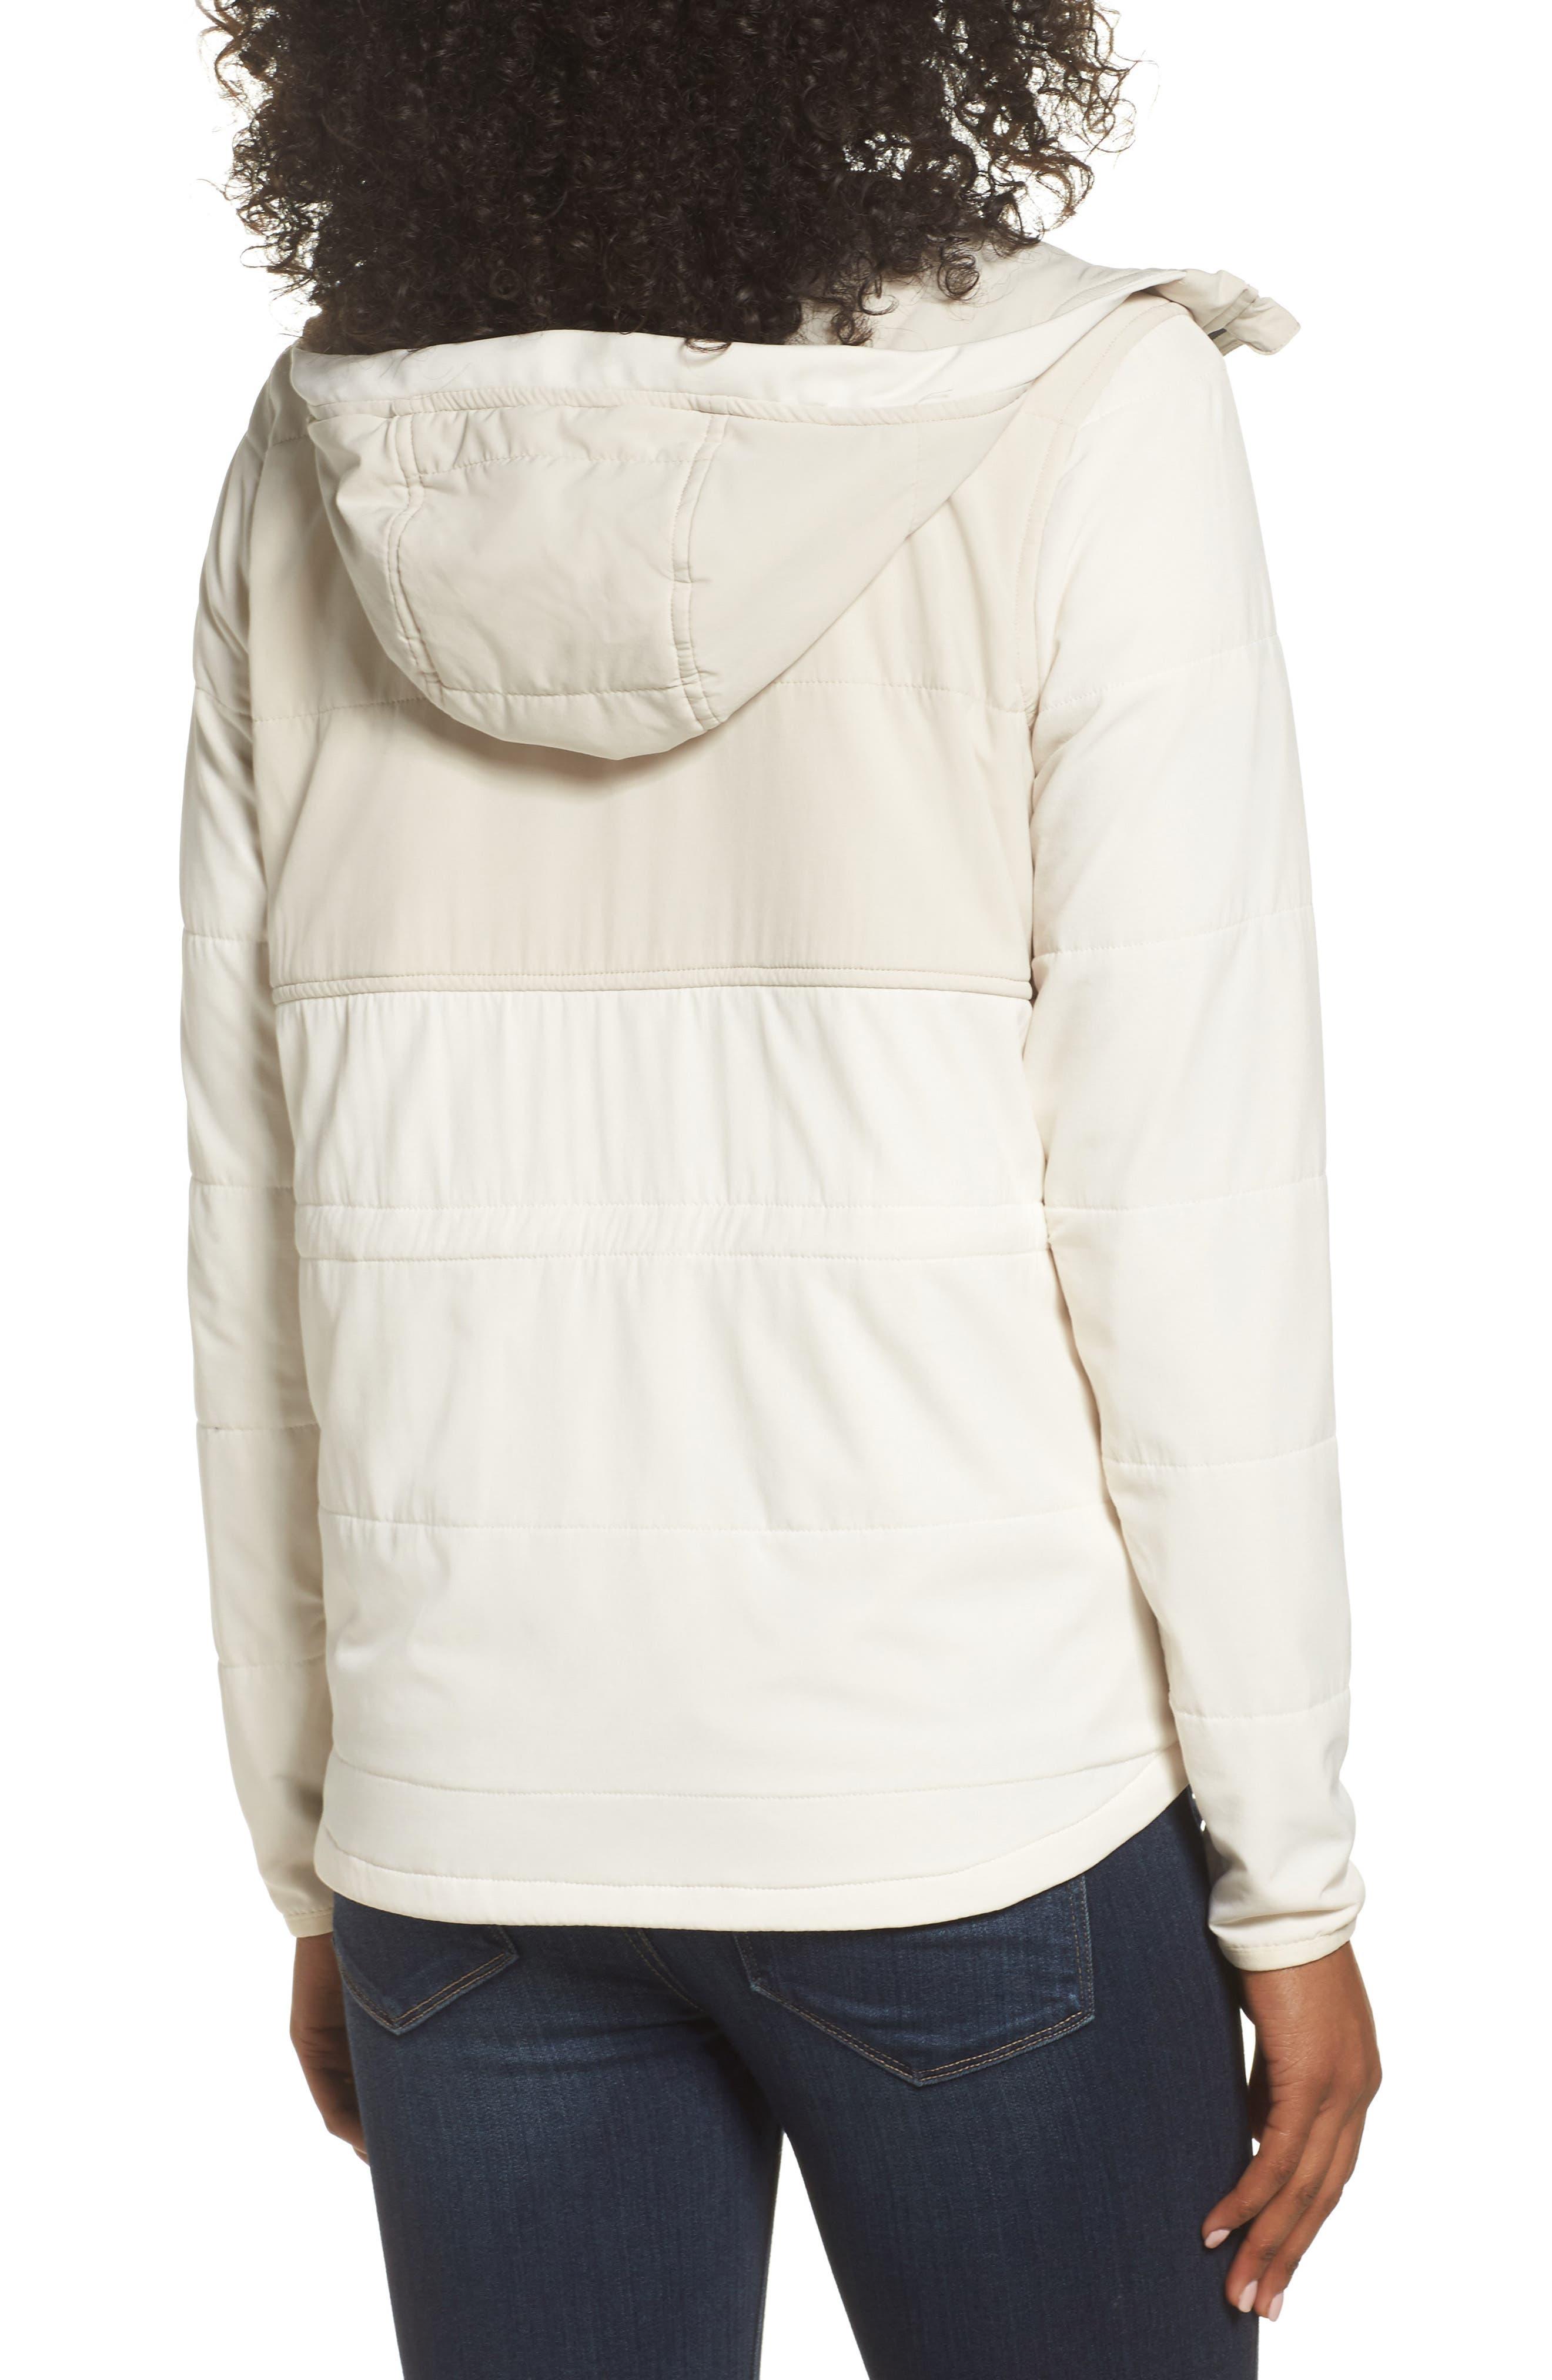 Mountain Sweatshirt Insulated Hooded Jacket,                             Alternate thumbnail 2, color,                             100